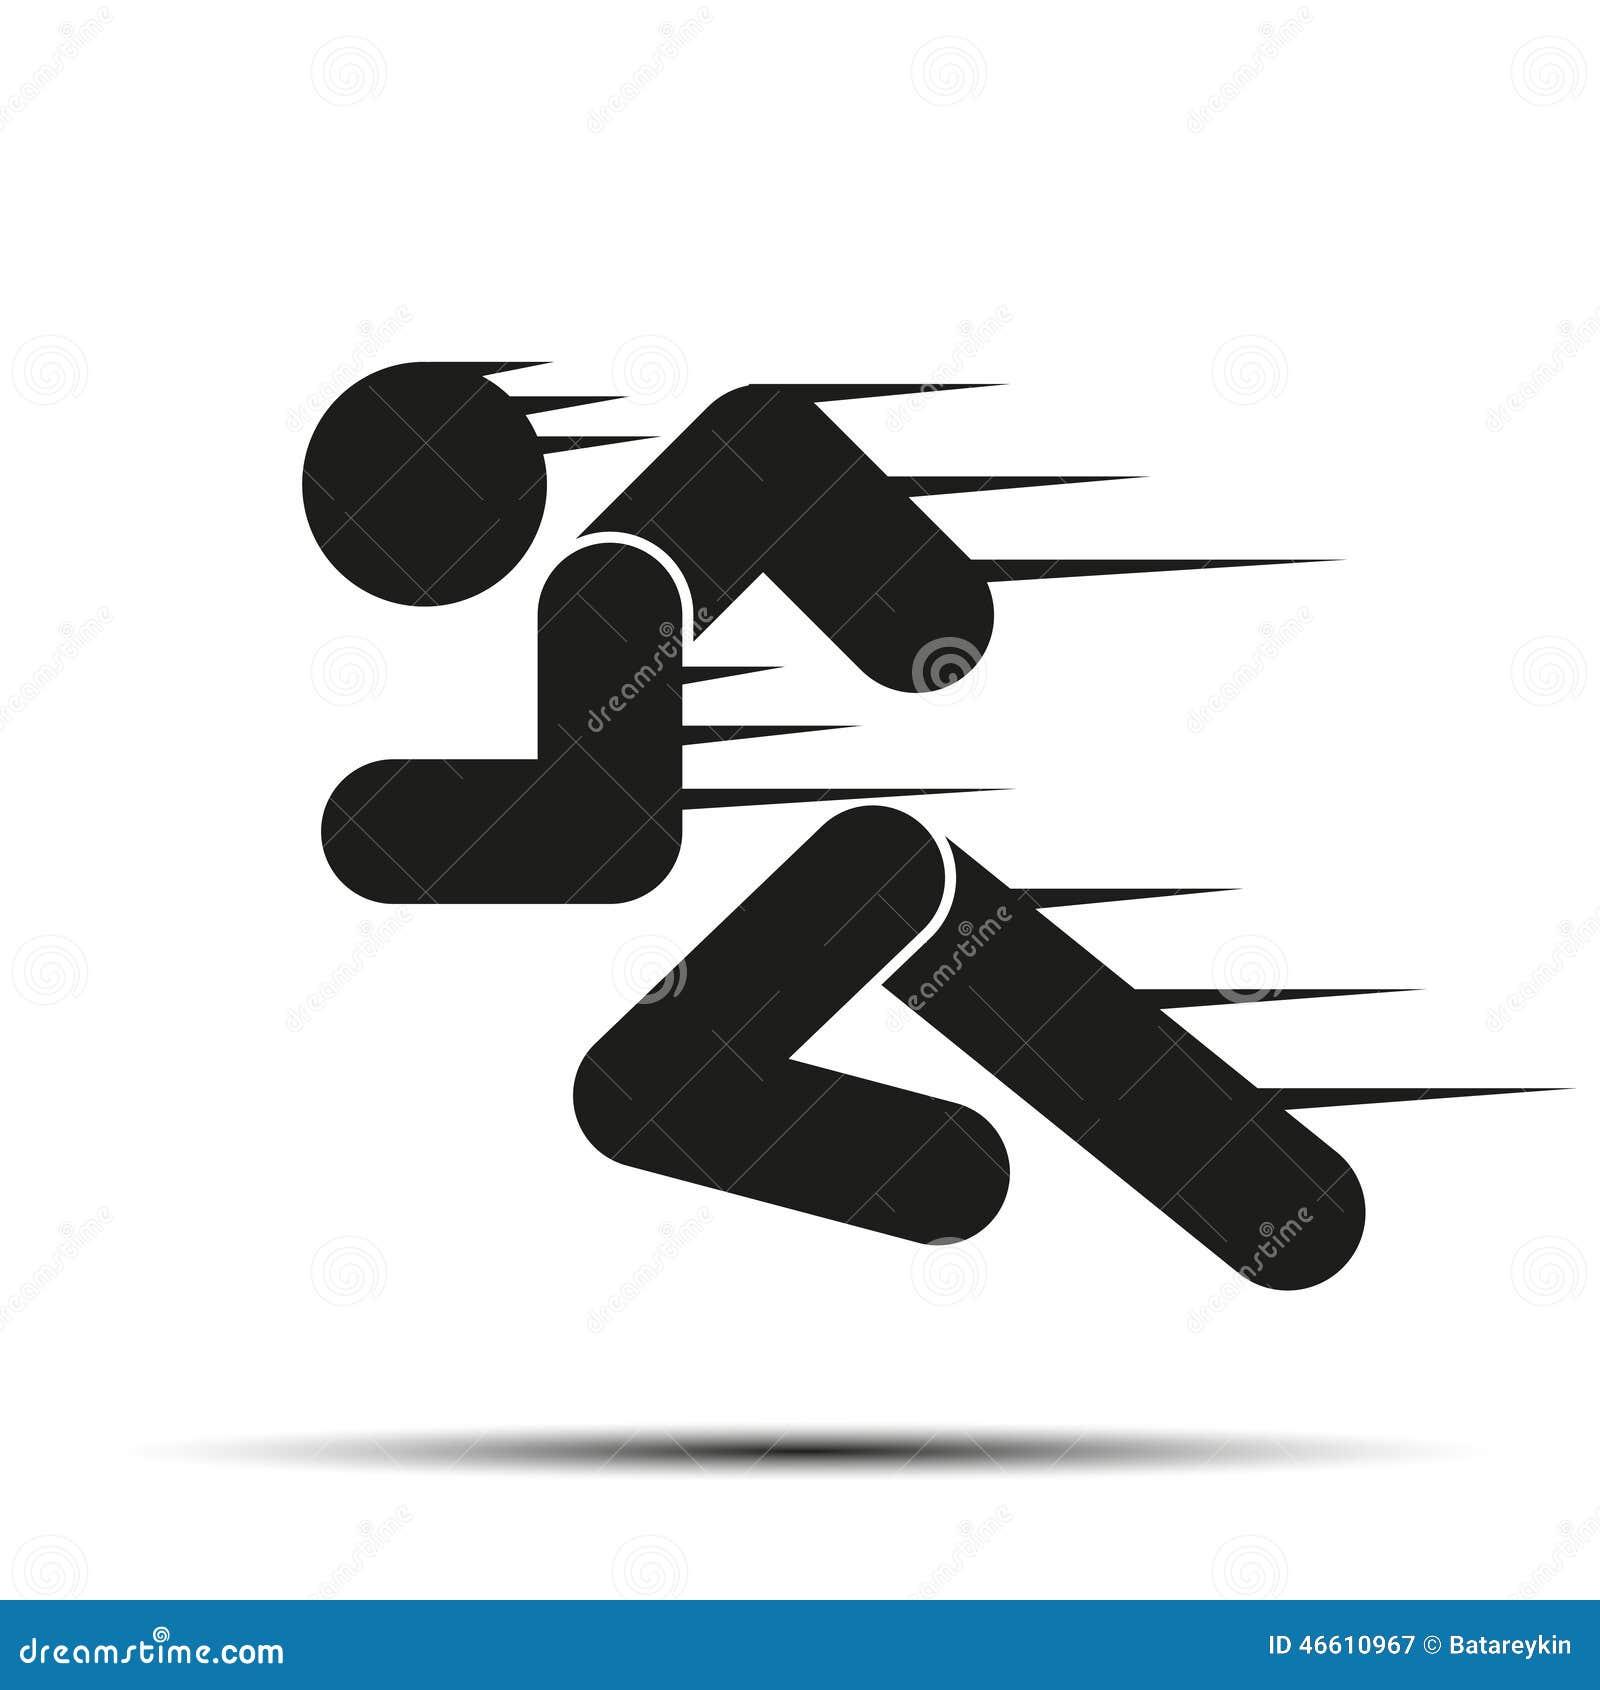 Running people in motion simple symbol of run stock for Illustration minimaliste